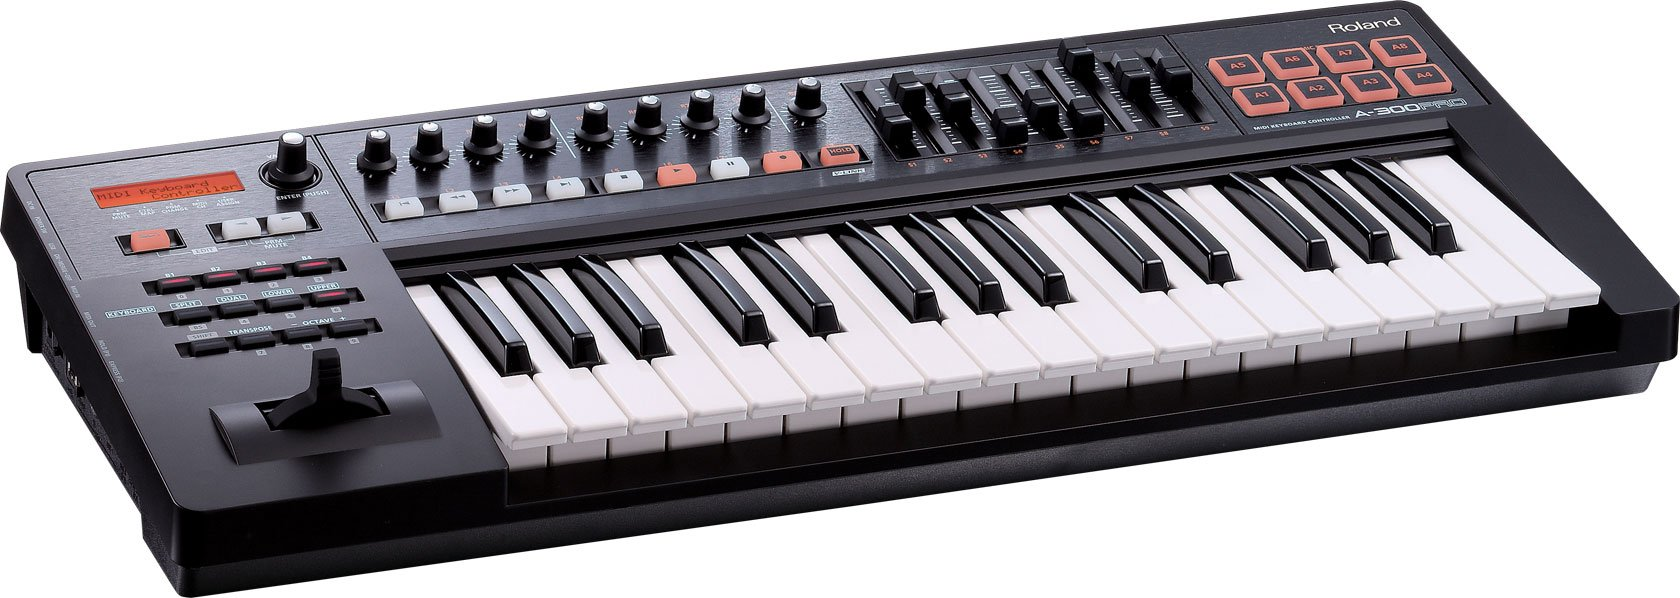 Roland 32-key MIDI Keyboard Controller, black (A-300PRO-R) by Roland (Image #2)